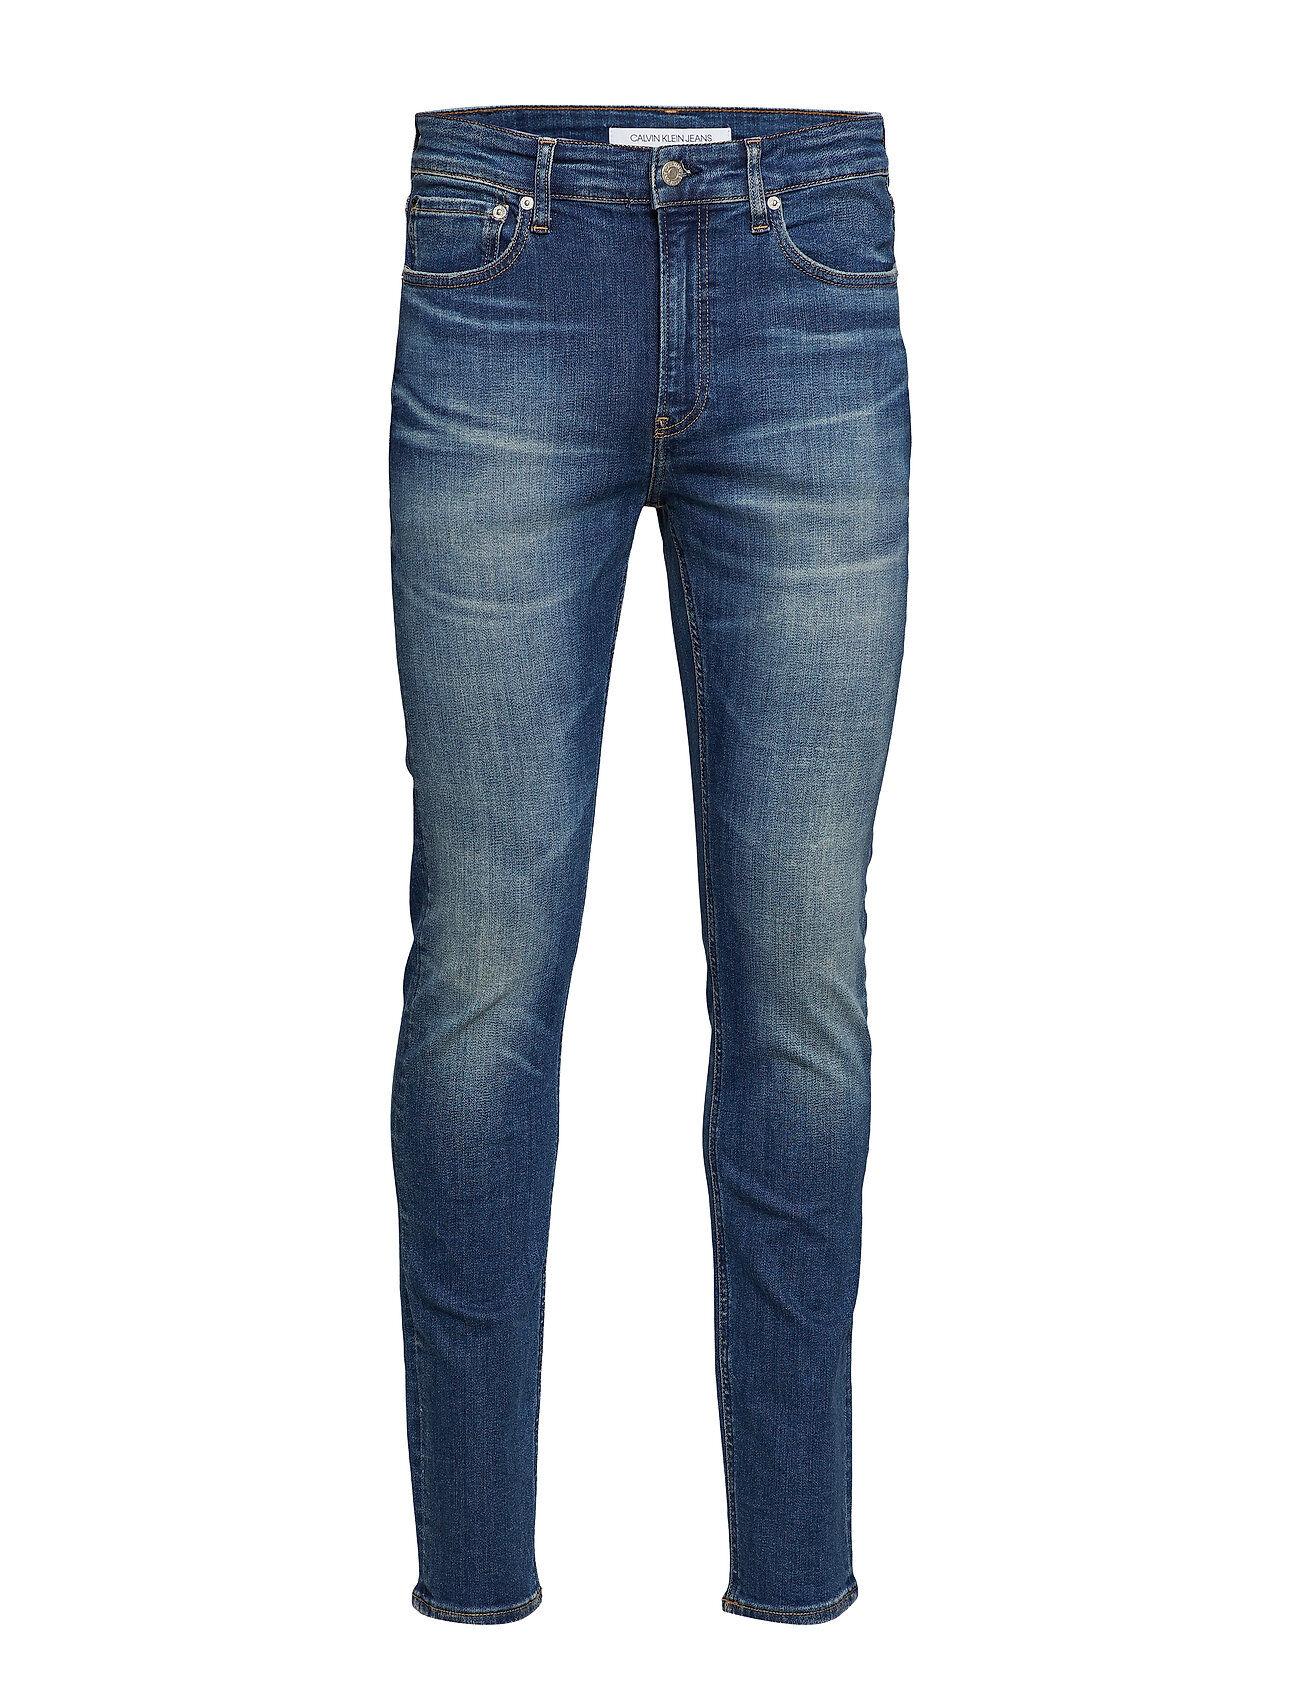 Image of Calvin Ckj 058 Slim Taper Skinny Farkut Sininen Calvin Klein Jeans